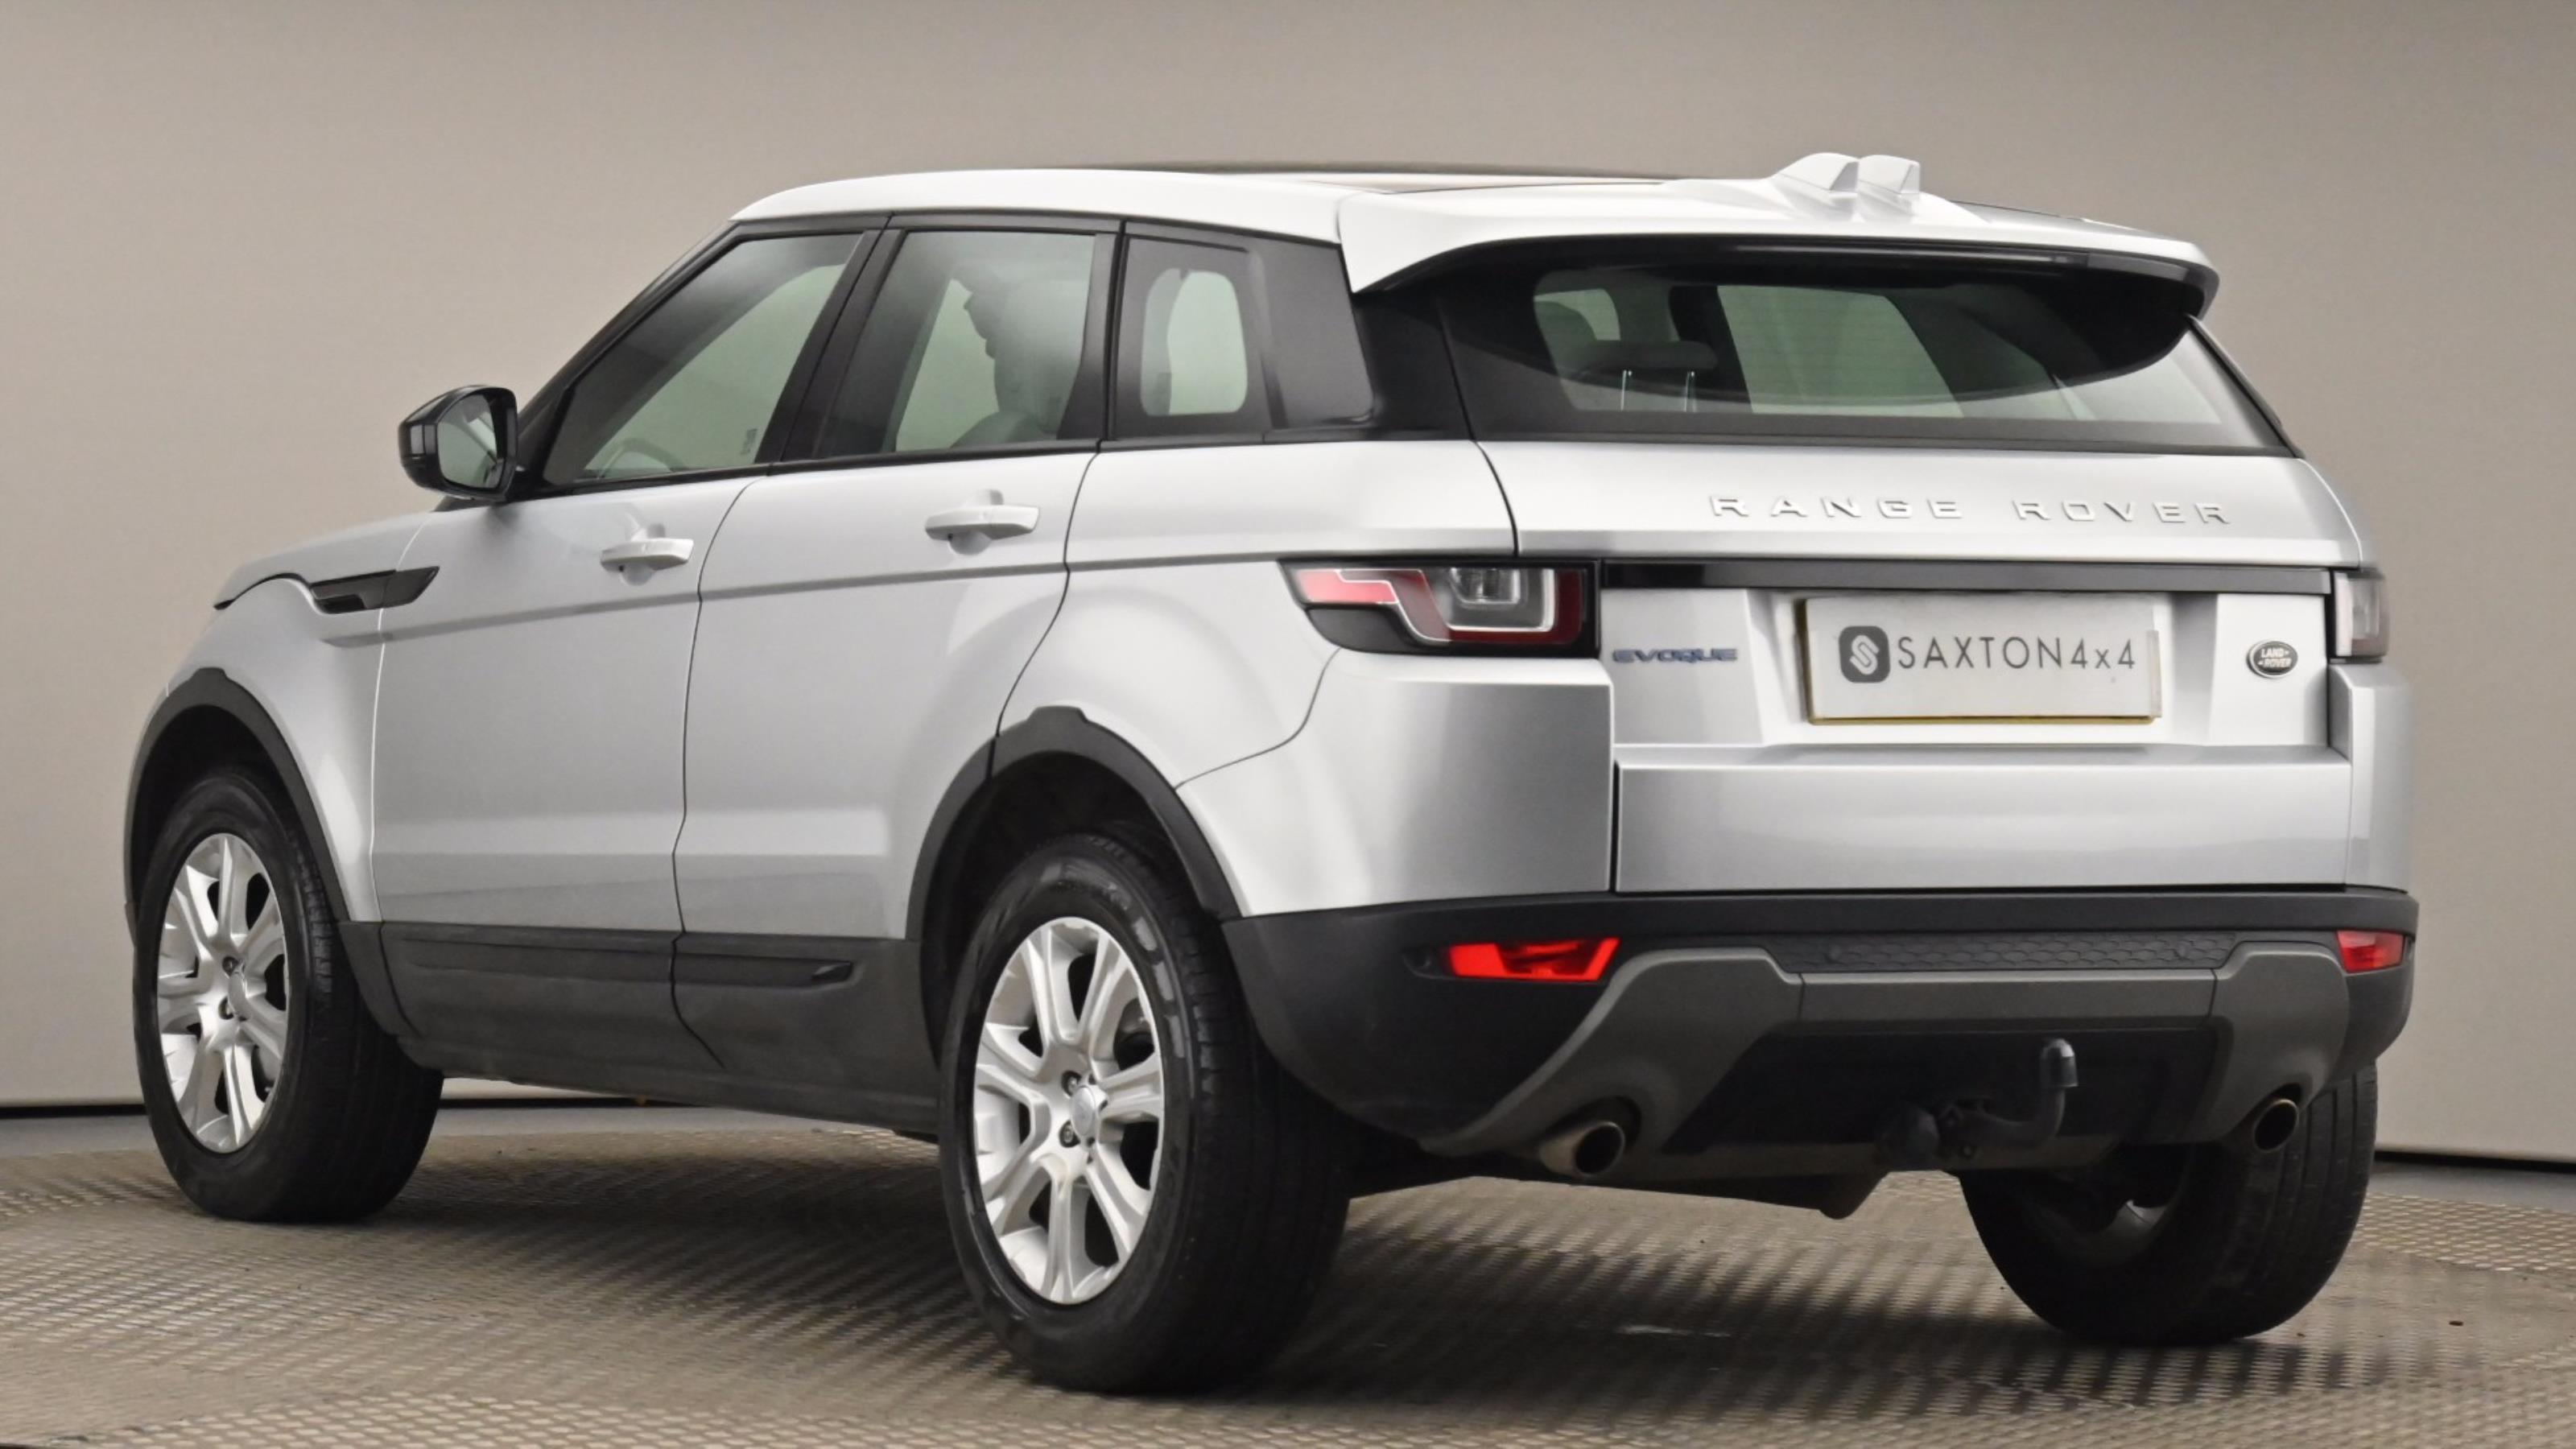 Used 16 Land Rover RANGE ROVER EVOQUE 2.0 eD4 SE Tech 5dr 2WD SILVER at Saxton4x4